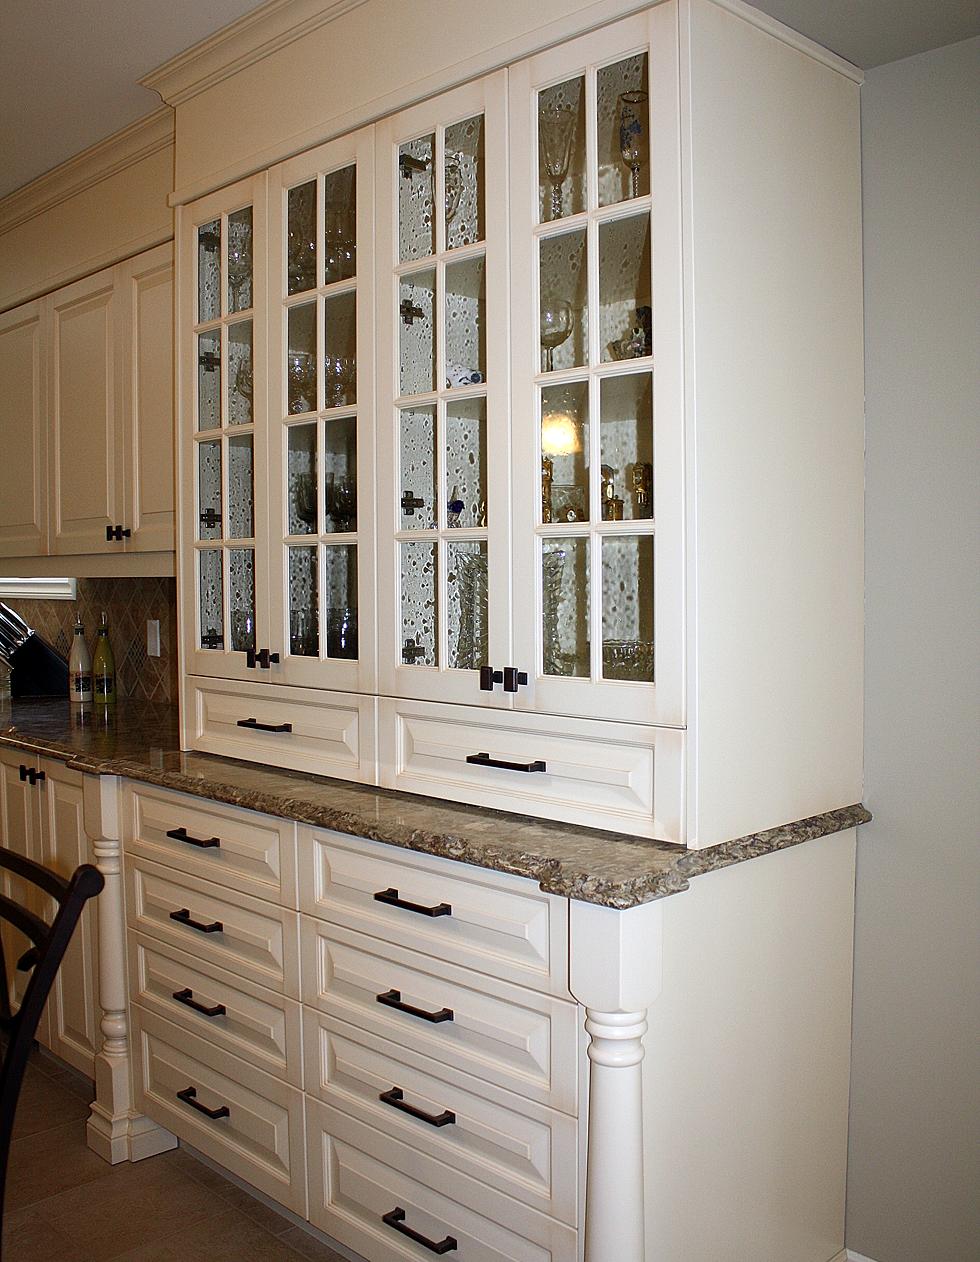 milestone millwork custom kitchen cabinets